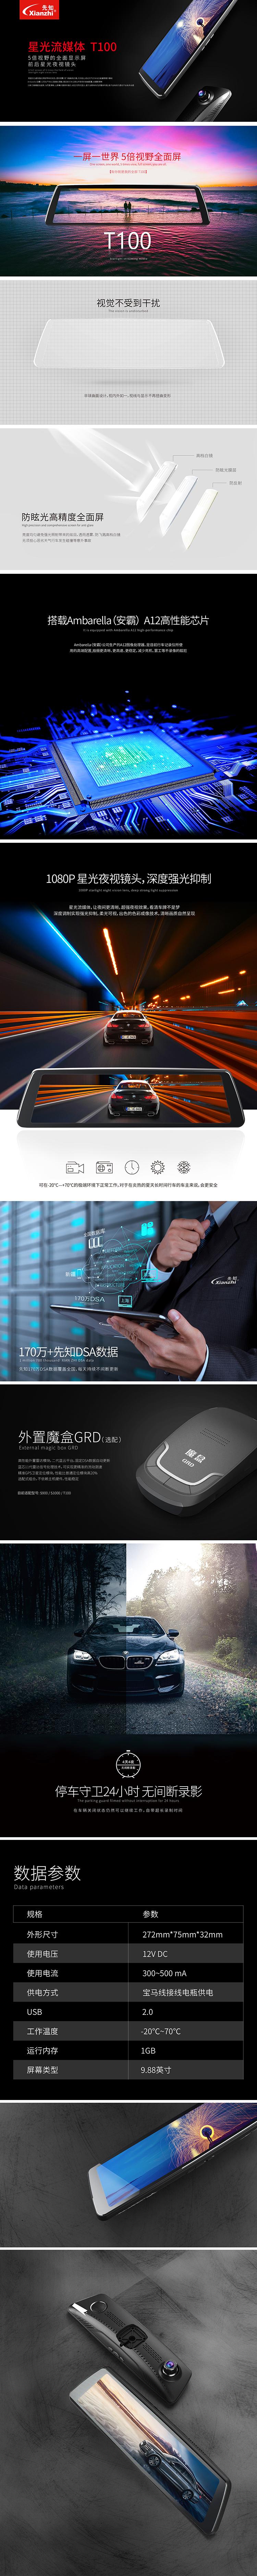 T100詳情_750.jpg